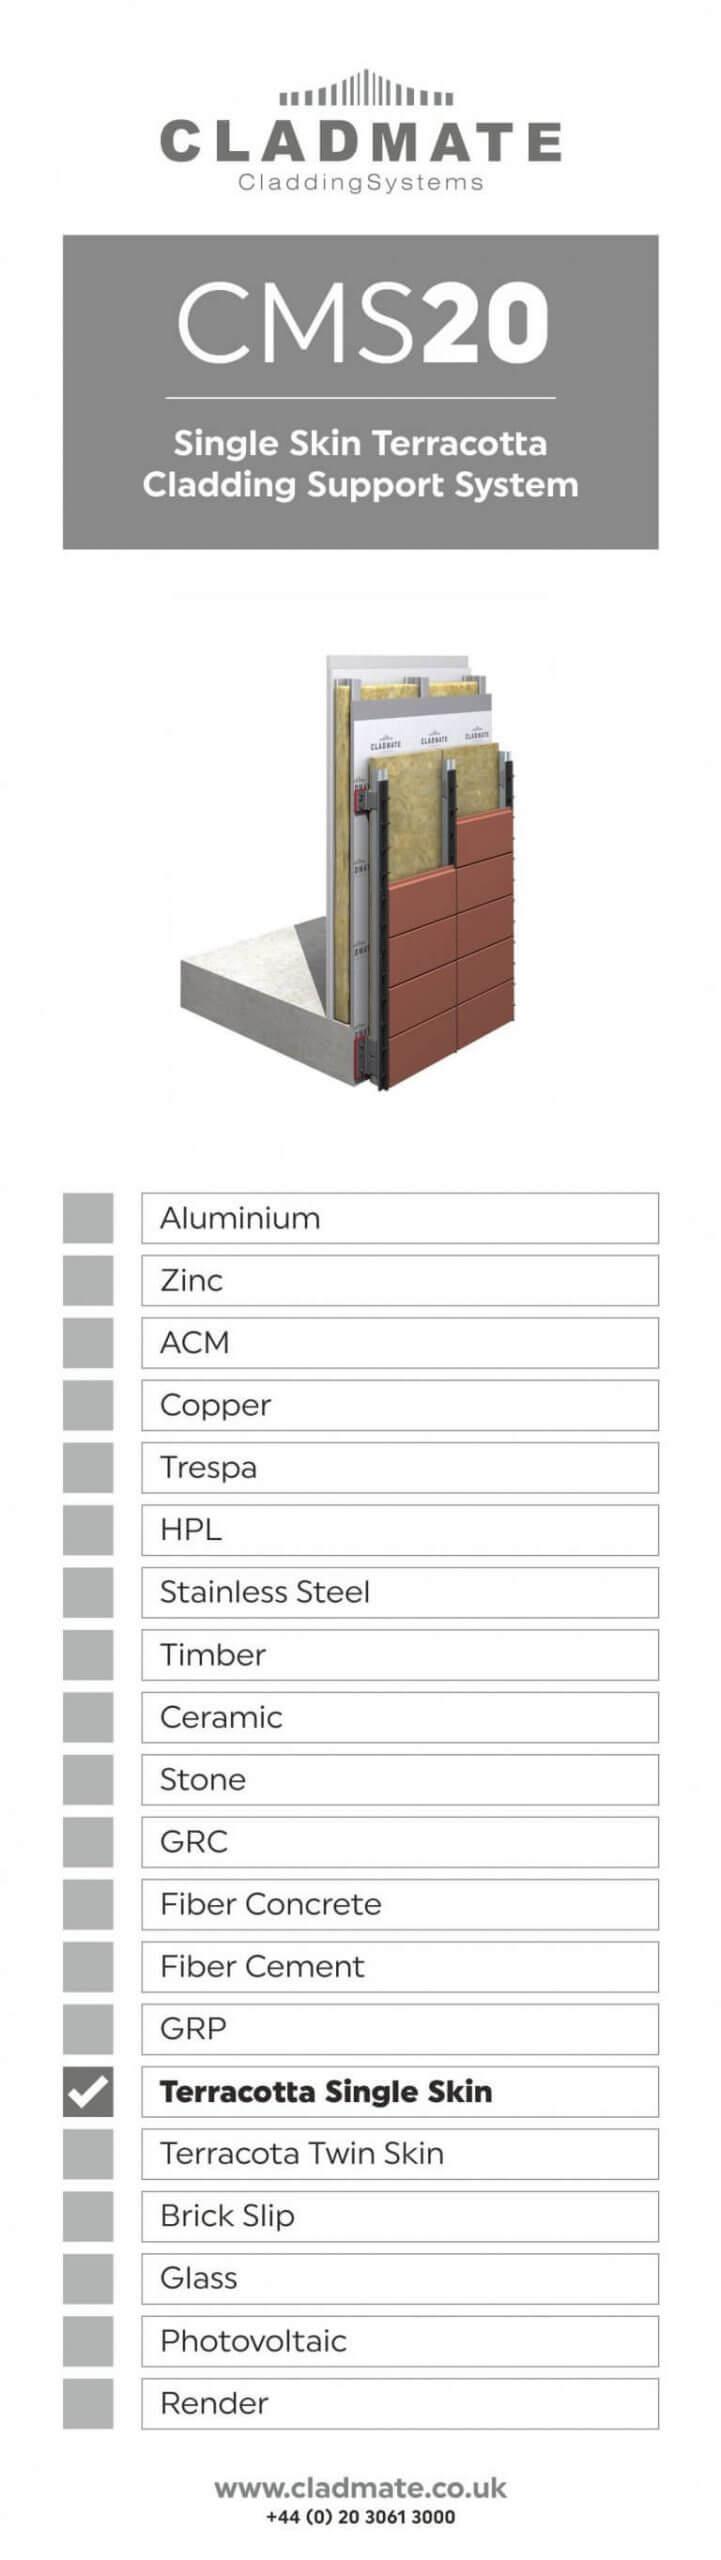 Single Skin Terracotta Cladding Panels Support